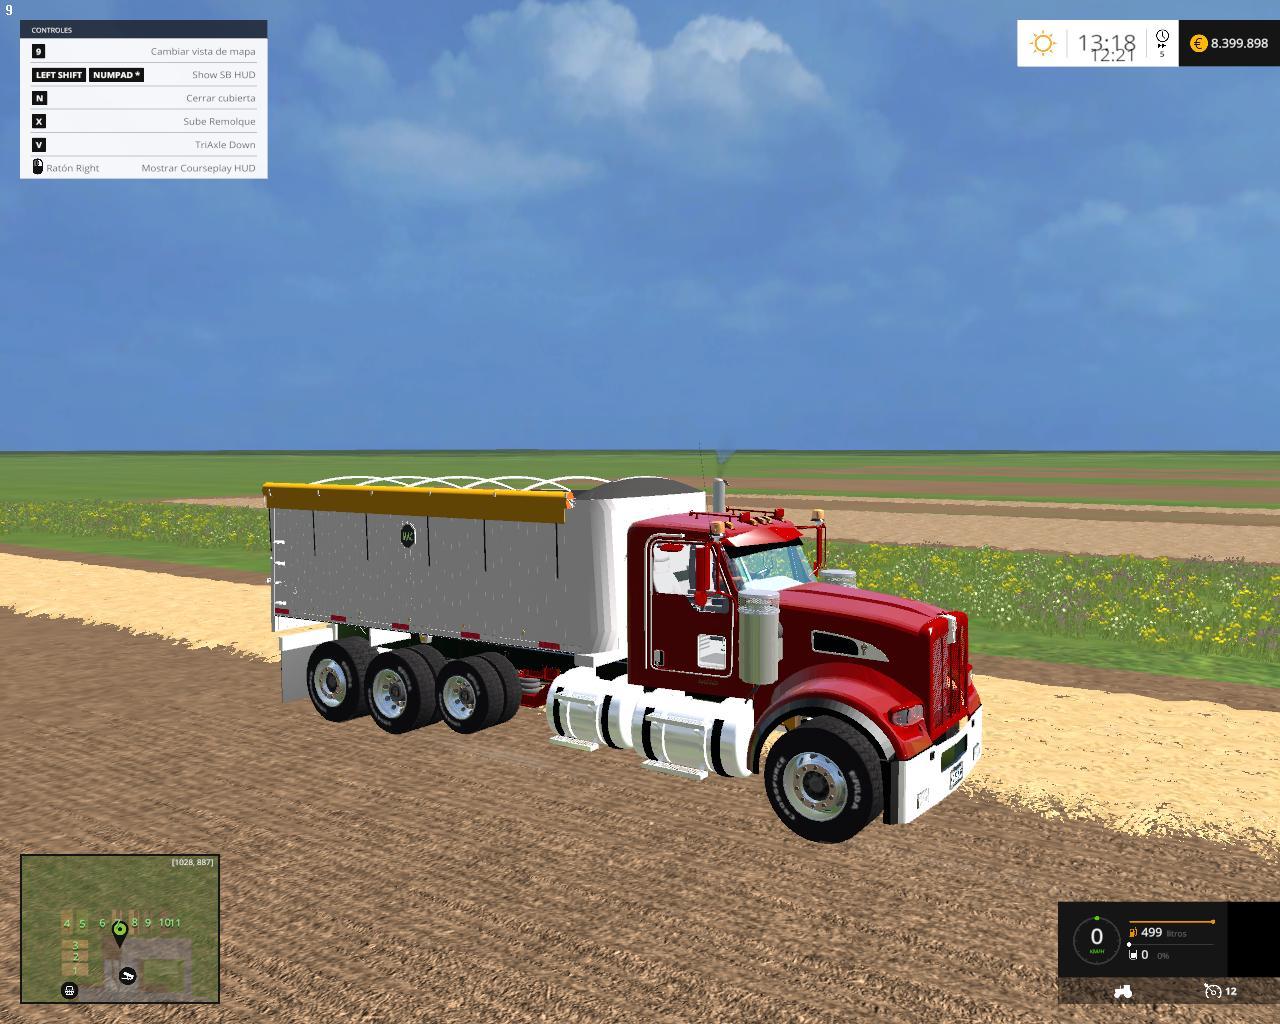 KENWORTH T440 V2 • Farming simulator 19, 17, 15 mods ...Kenworth Dump Trucks Fs19